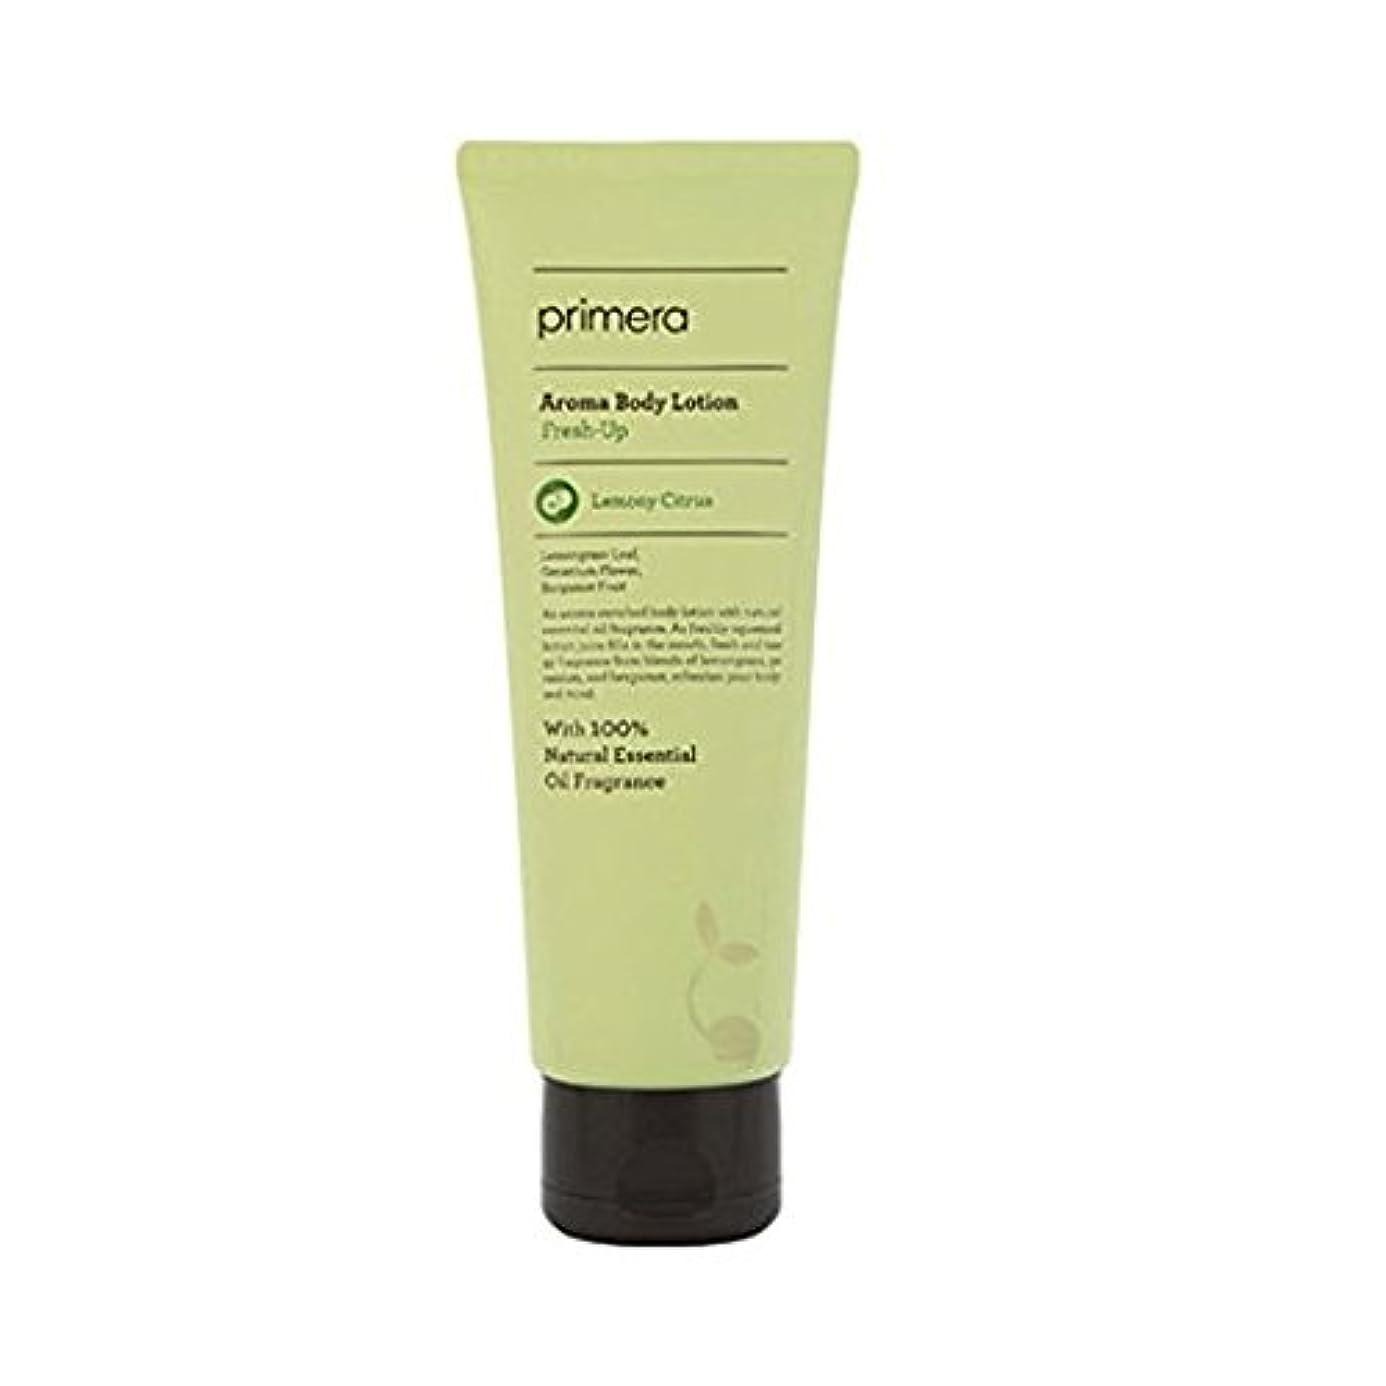 Primera(プリメラ) アロマ ボディー ローション フレッシュアップ230ml /Primera Aroma Body Lotion fresh-up 230ml[海外直送品] [並行輸入品]